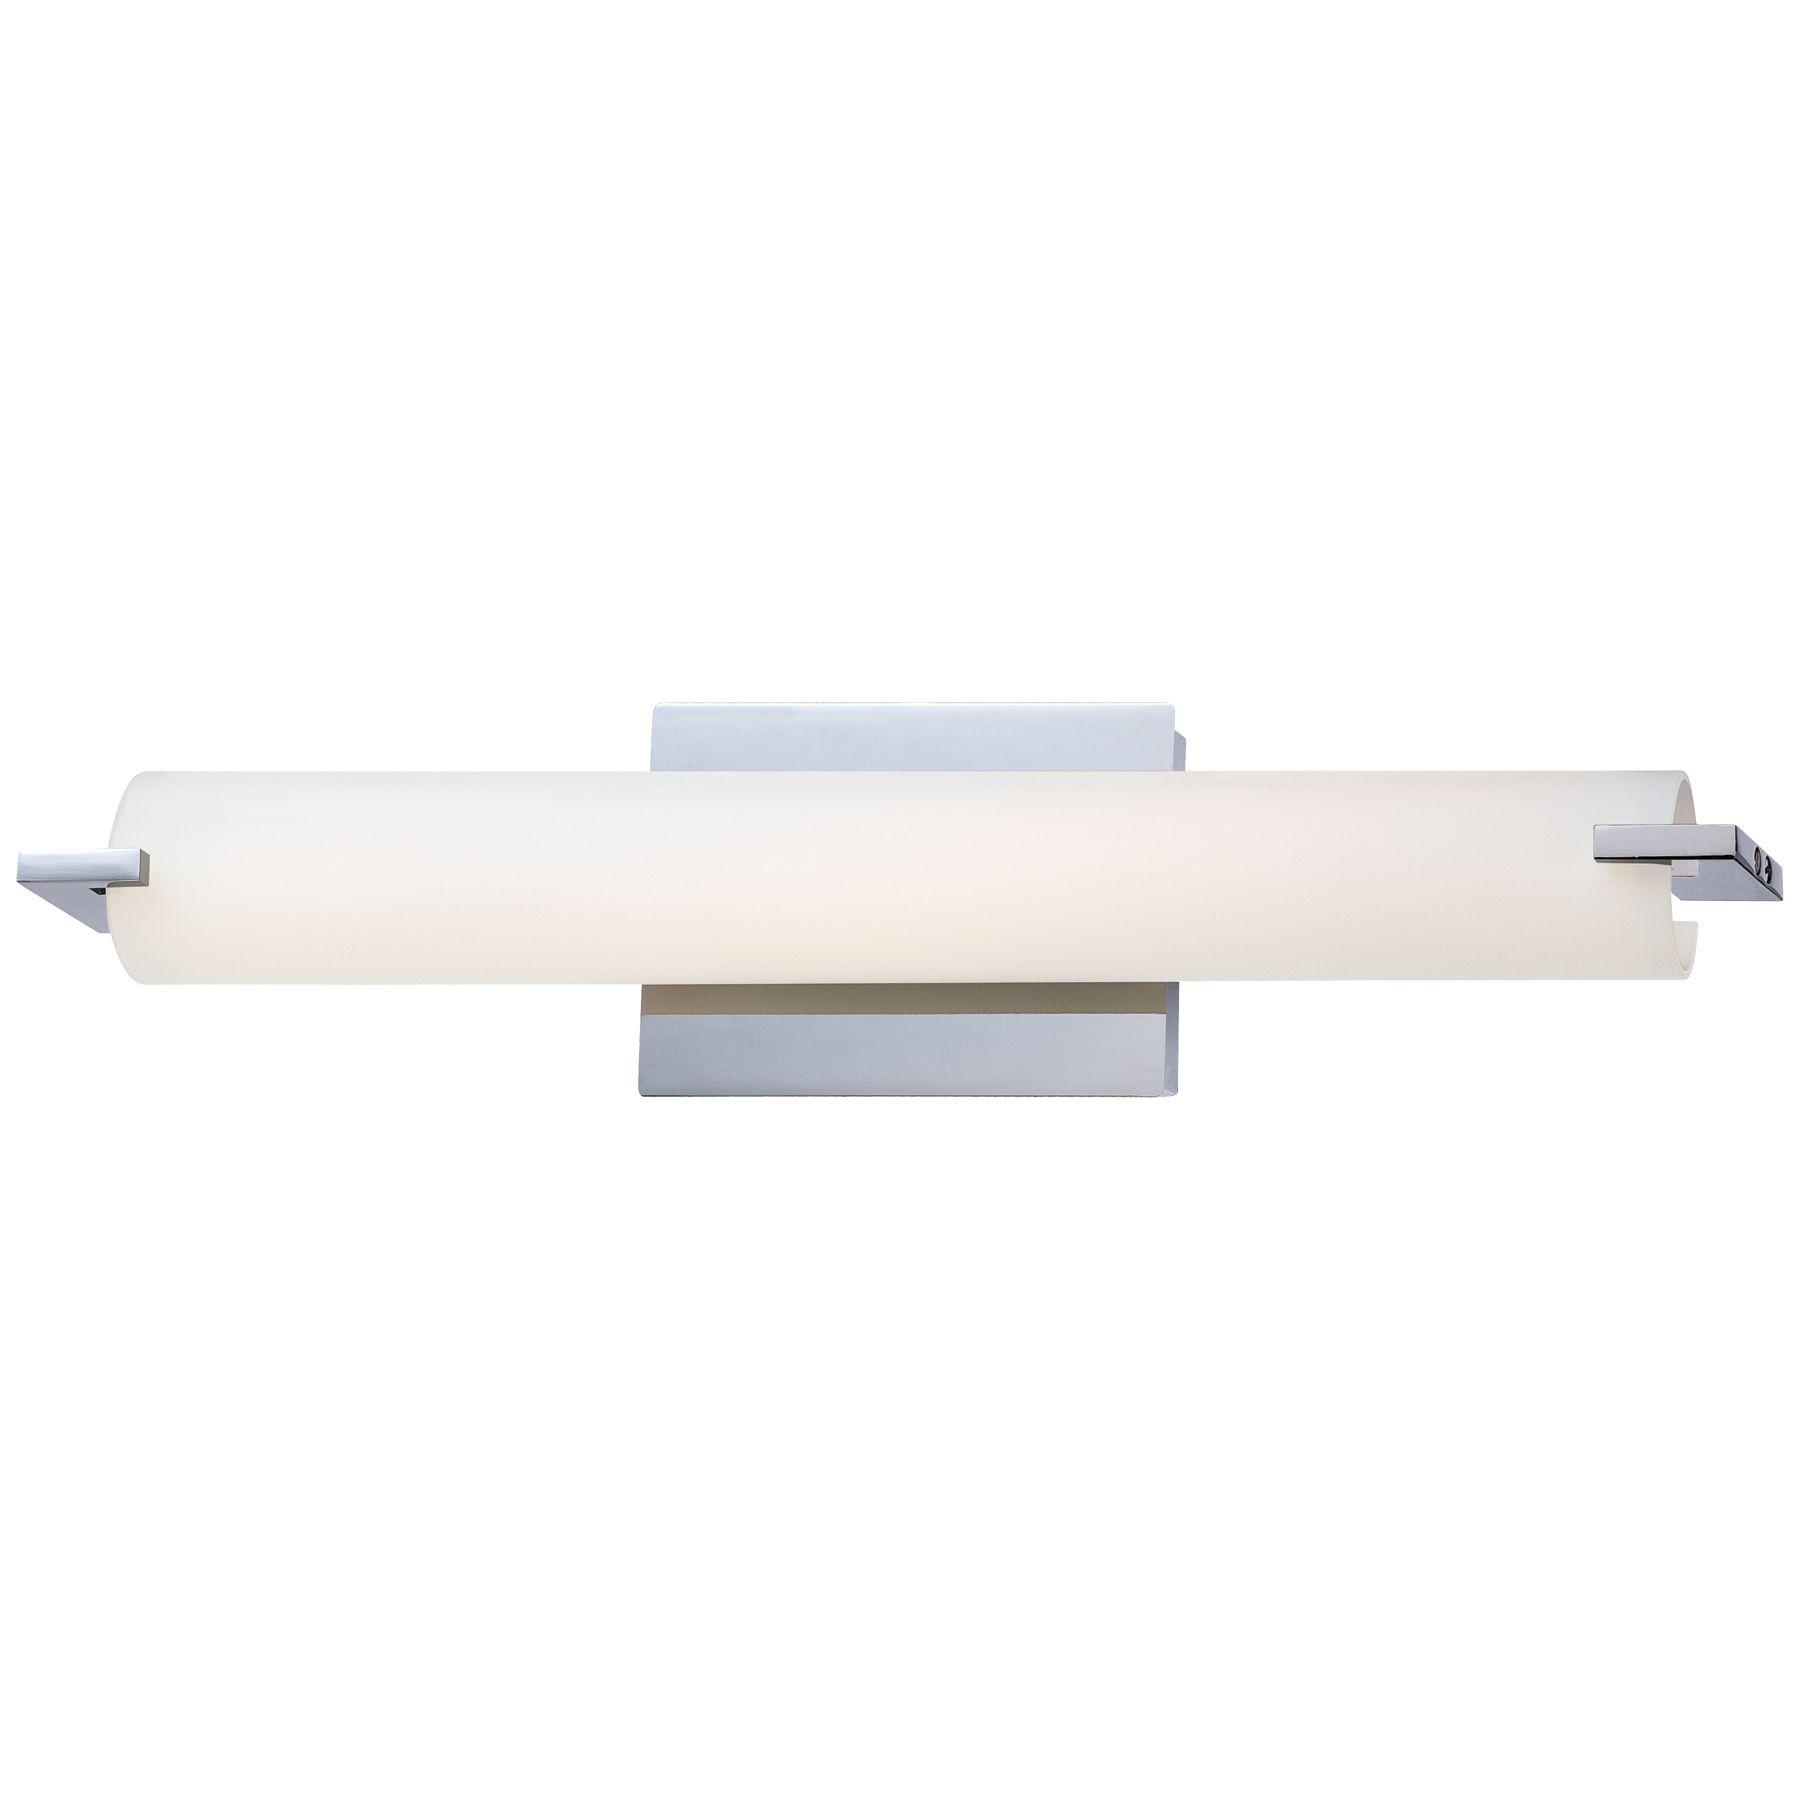 Tube Bathroom Vanity Light By George Kovacs P5044 077 L Led Bathroom Lights Bathroom Light Bar Bath Light